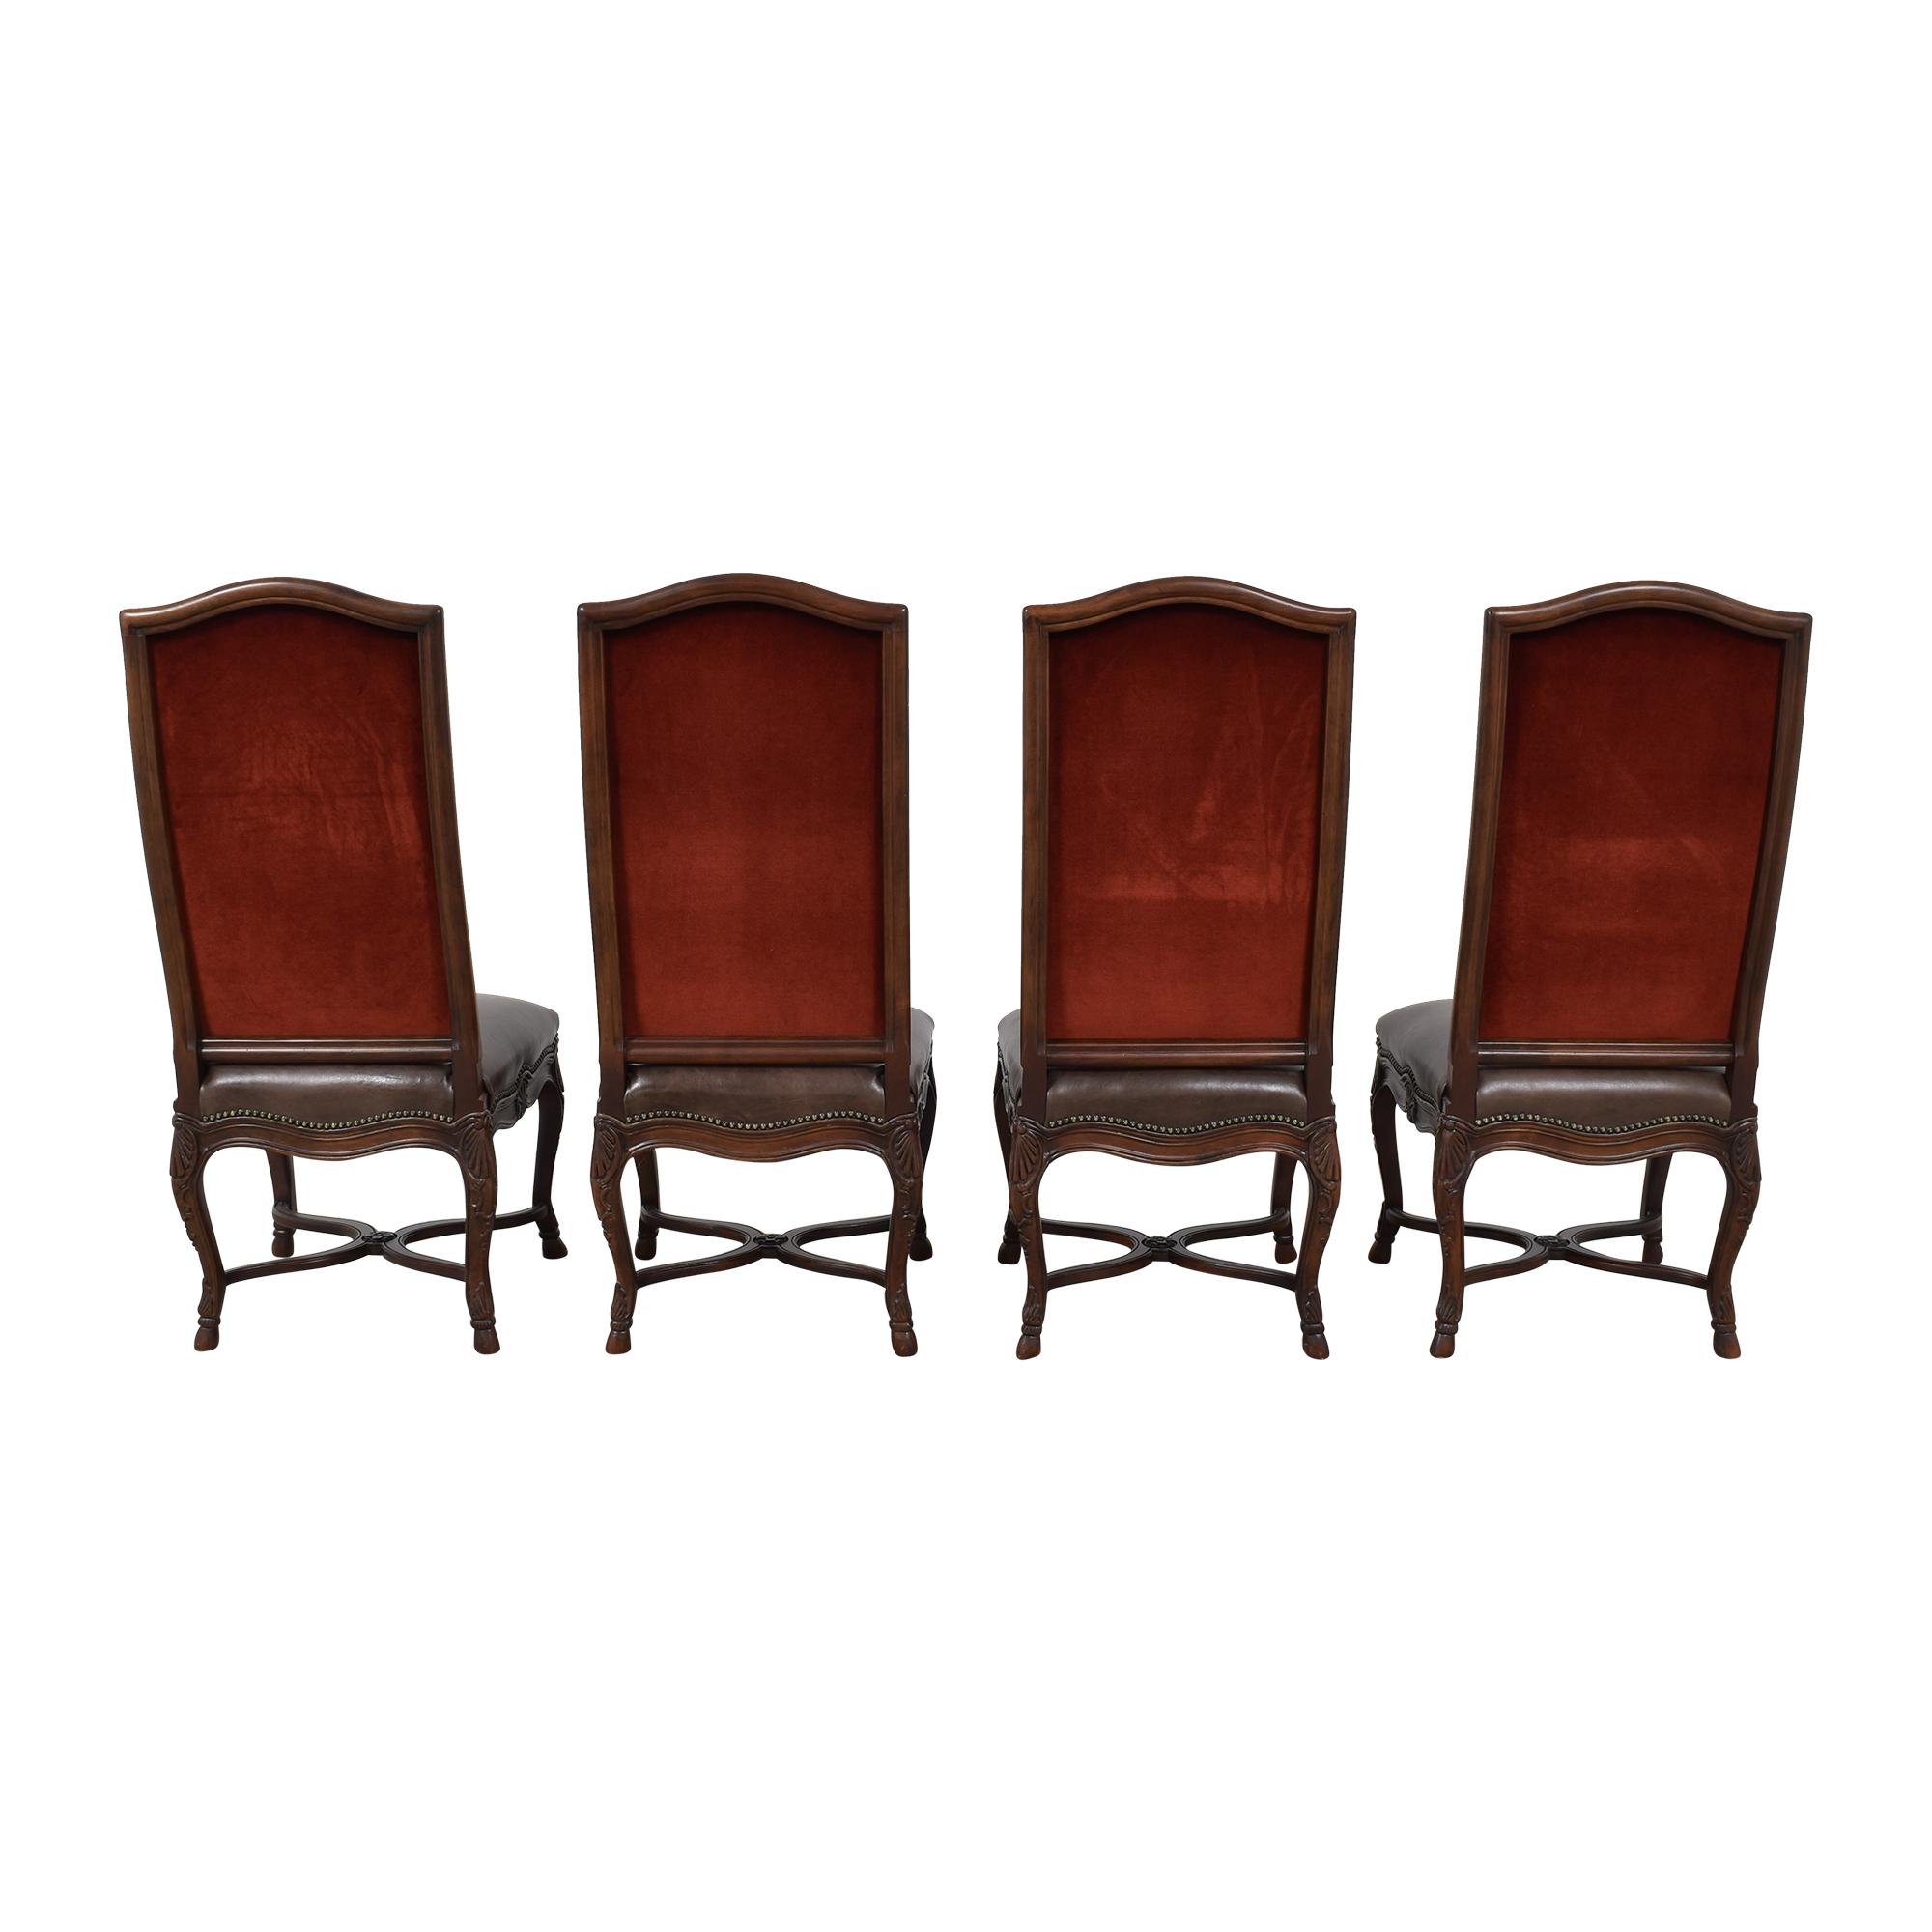 Safavieh Safavieh High Back Formal Dining Chairs pa